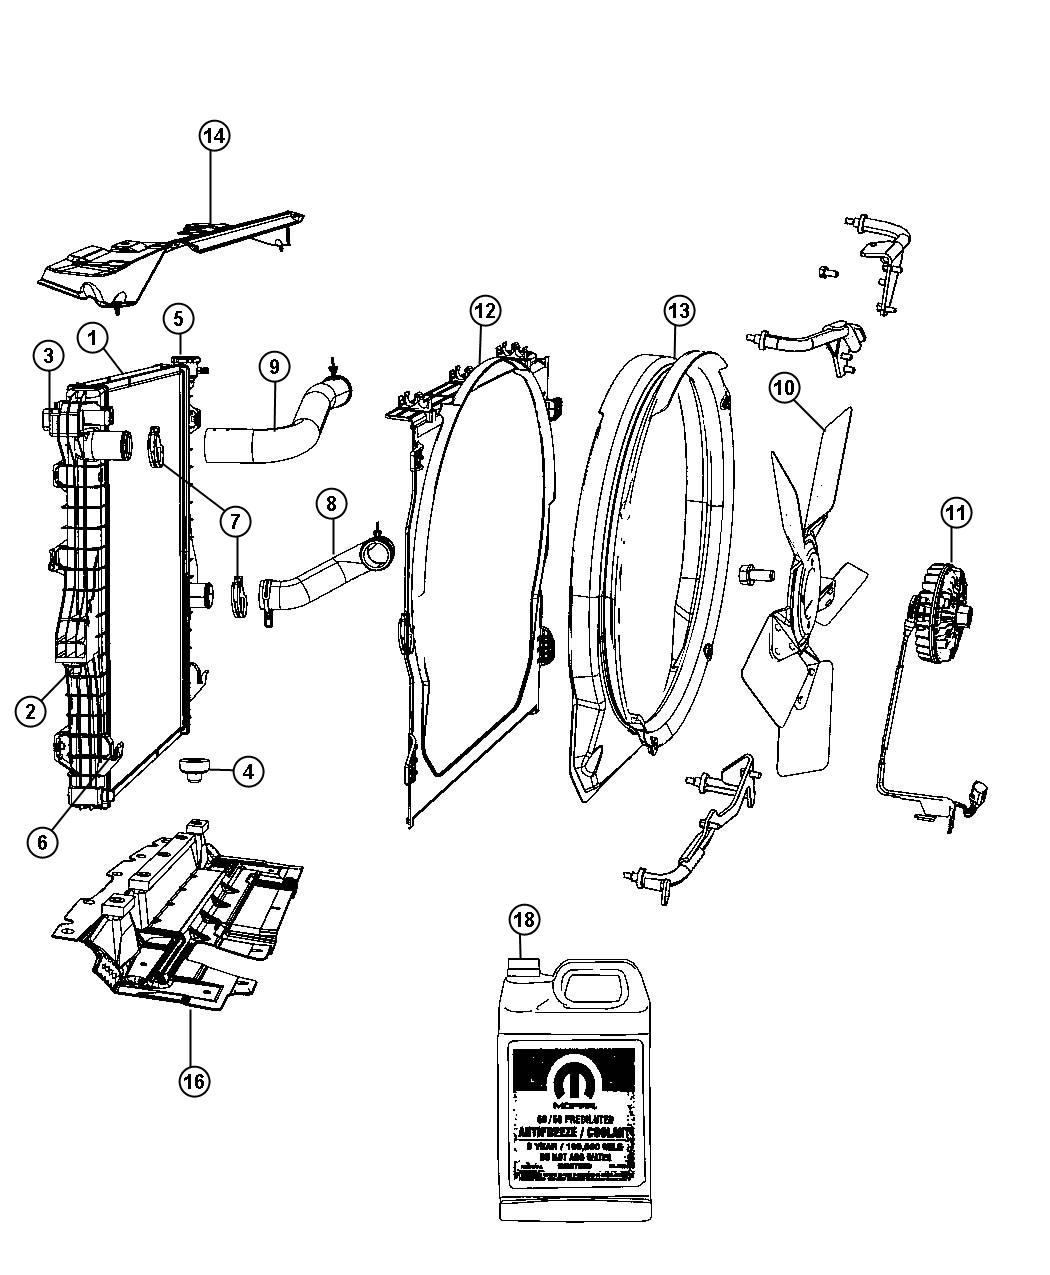 tags: #2001 ford excursion radio wiring diagram#ford 7 3 powerstroke idm  diagram#01 powerstroke fuel injector wiring diagram#97 powerstroke pcm  wiring